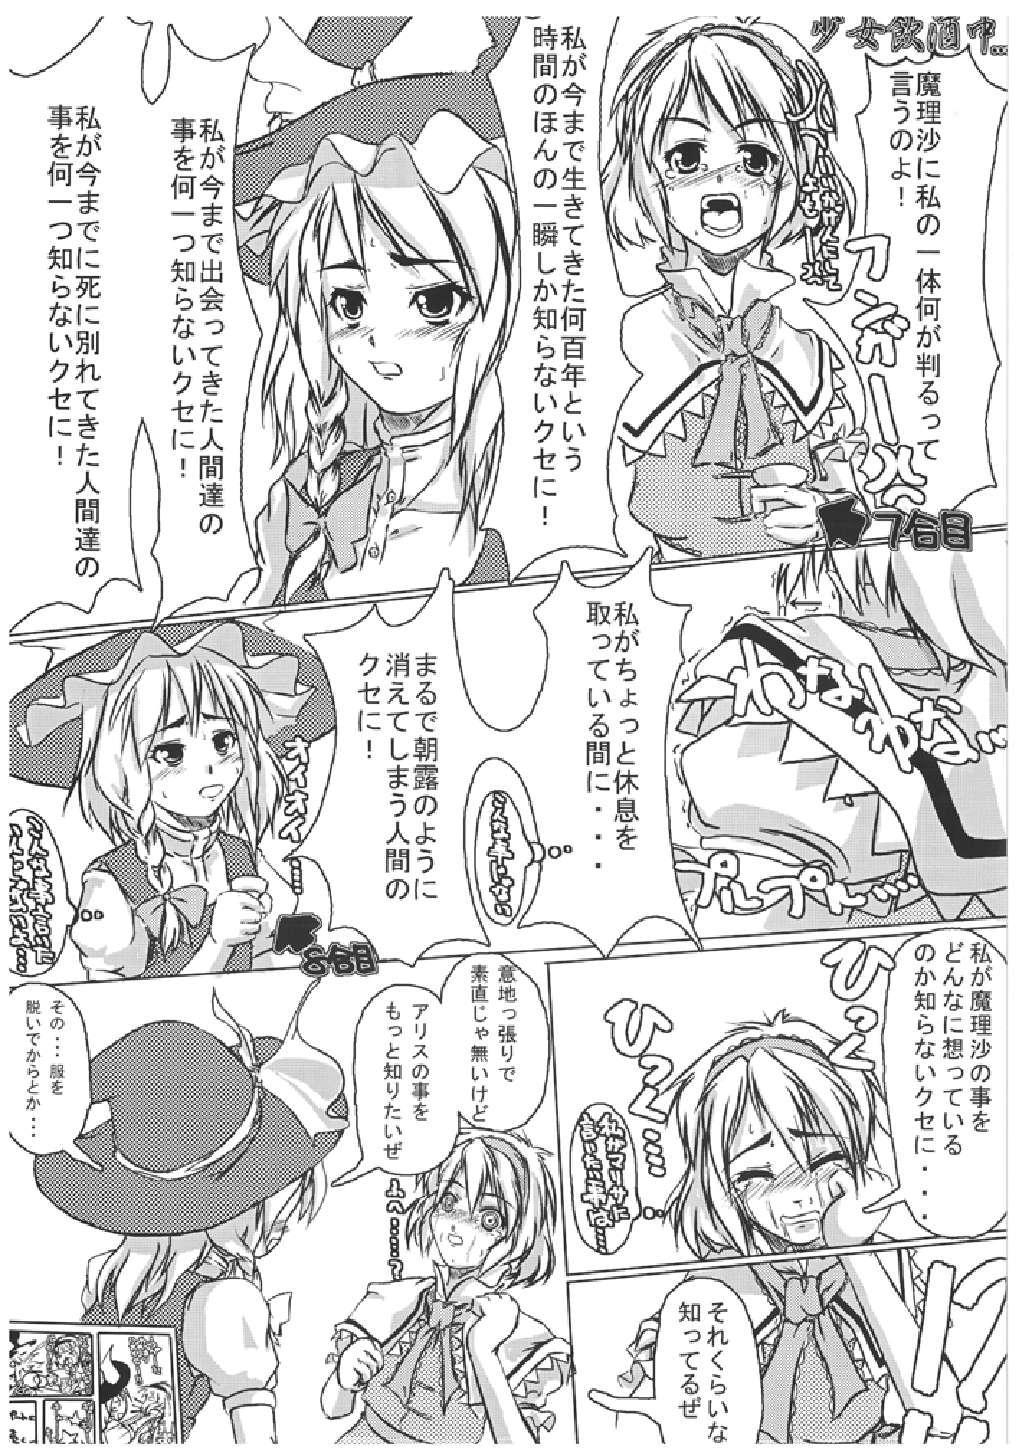 Mahou Shoujo Ryoujoku Hon - Aizouban 7